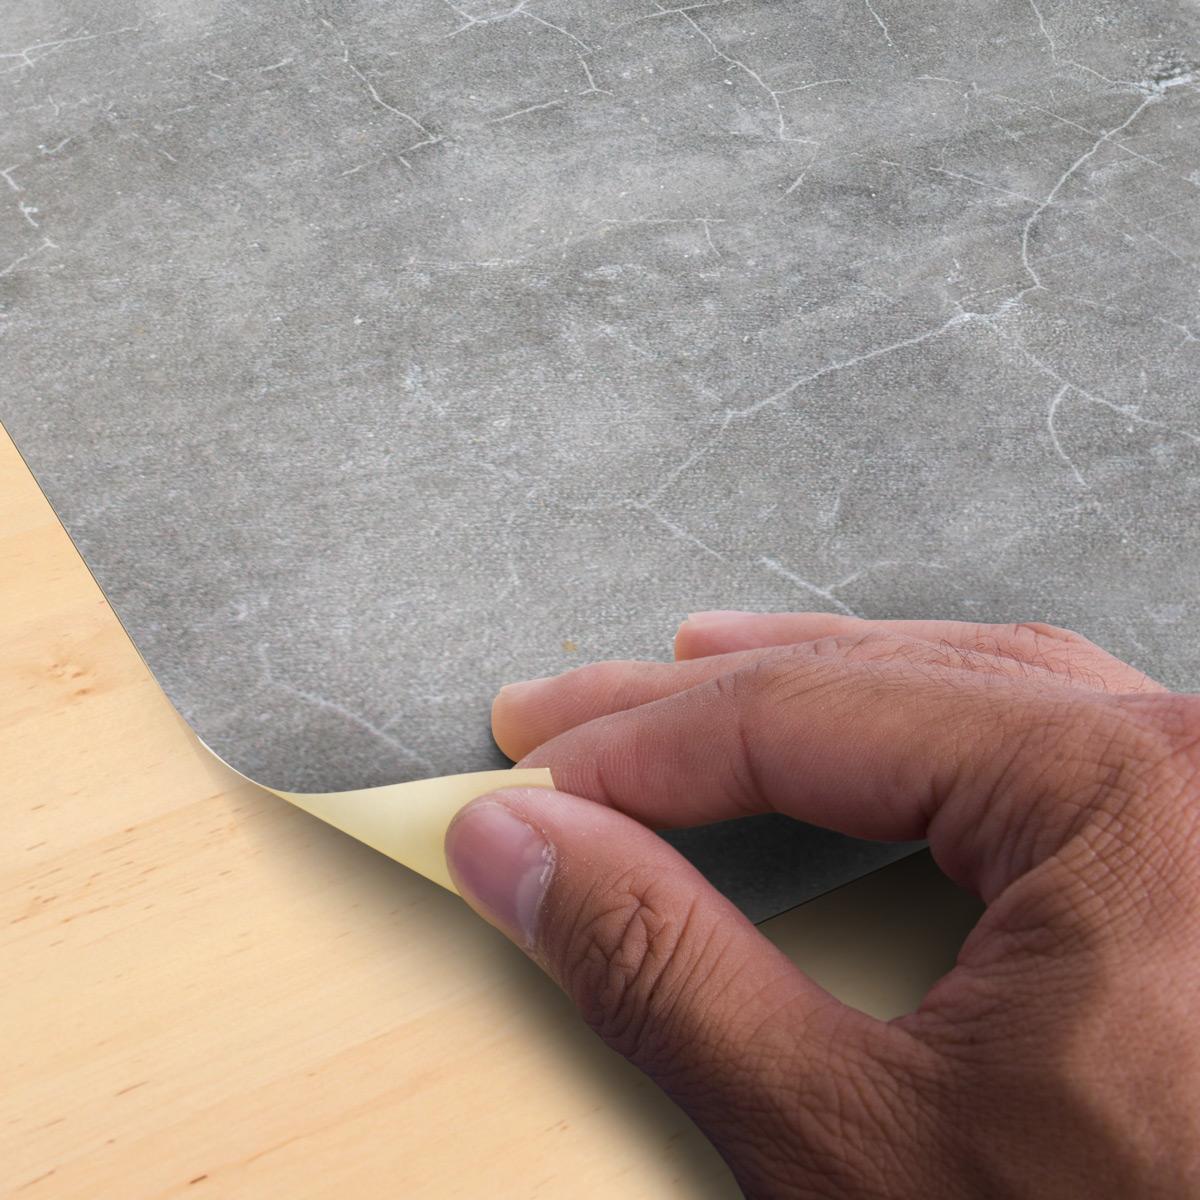 Wandtattoo Zementfliesen Anti Rutsch Platte Gewachster Beton Bad Badezimmer Ambiance Sticker